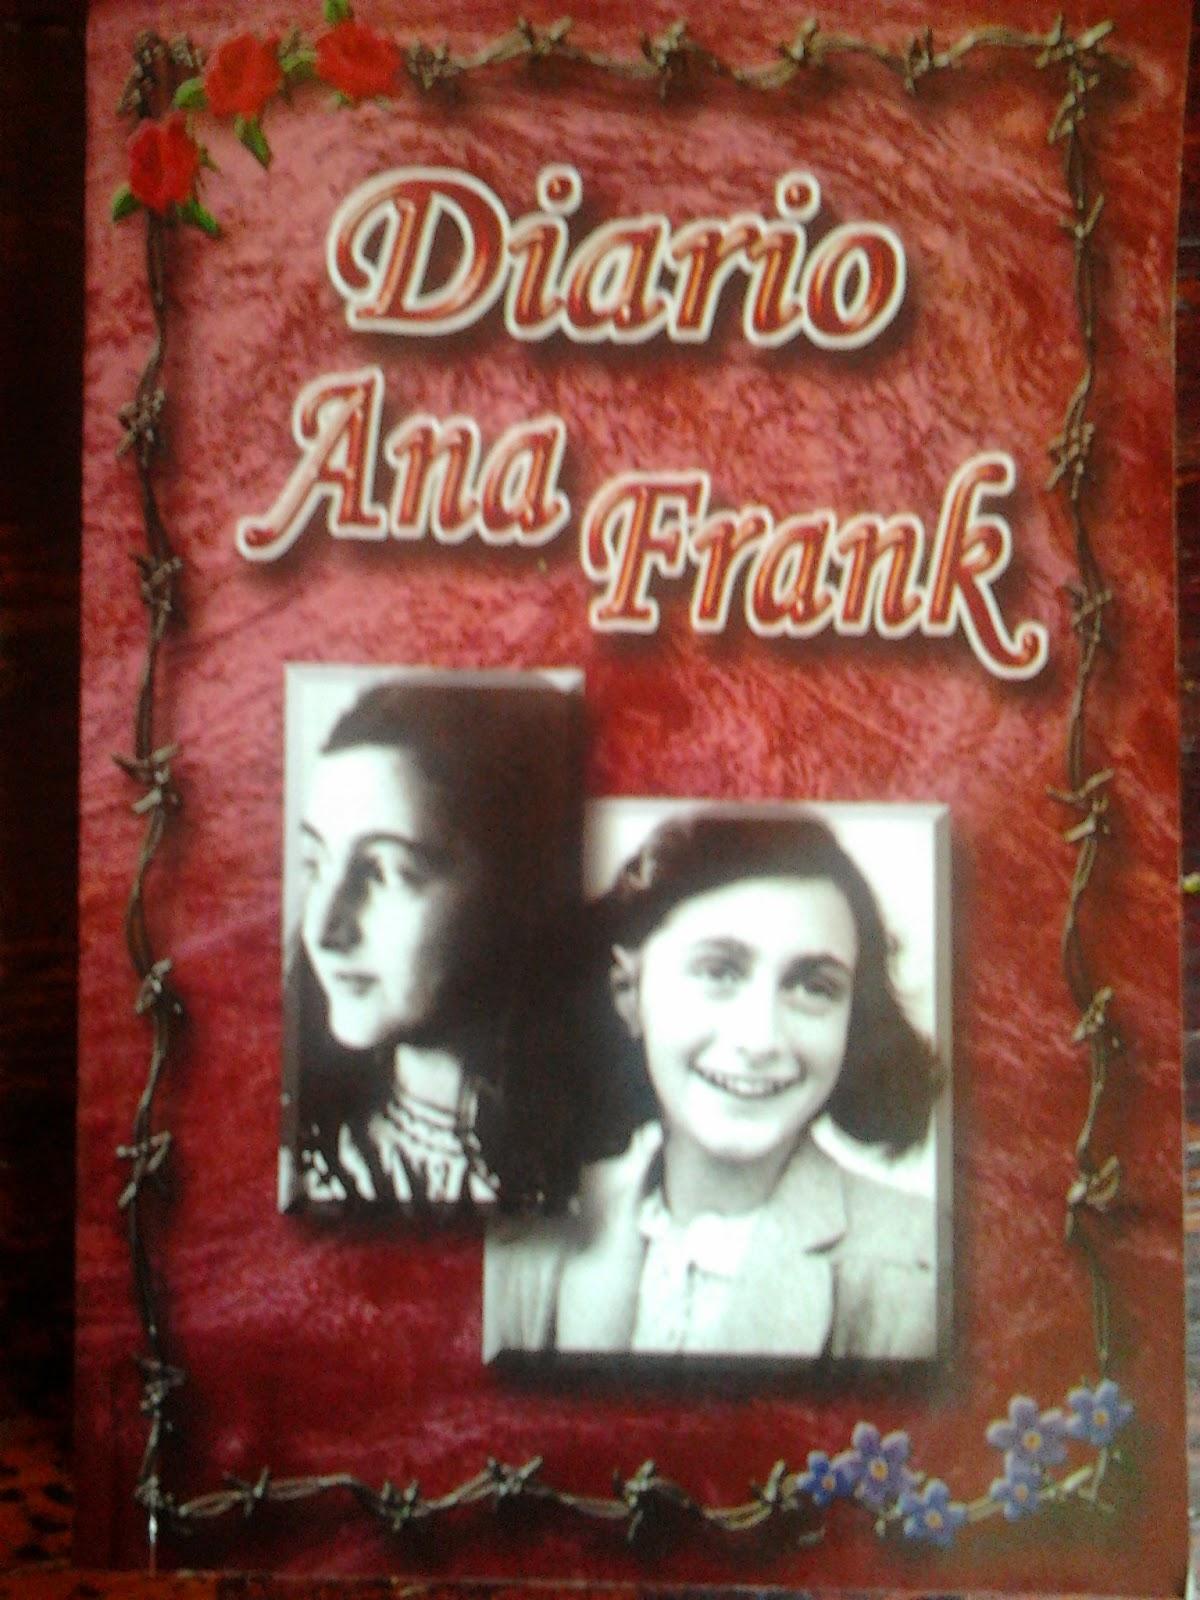 http://aruka-capulet-marsella.blogspot.mx/2014/10/resena-librodiario-ana-frank.html